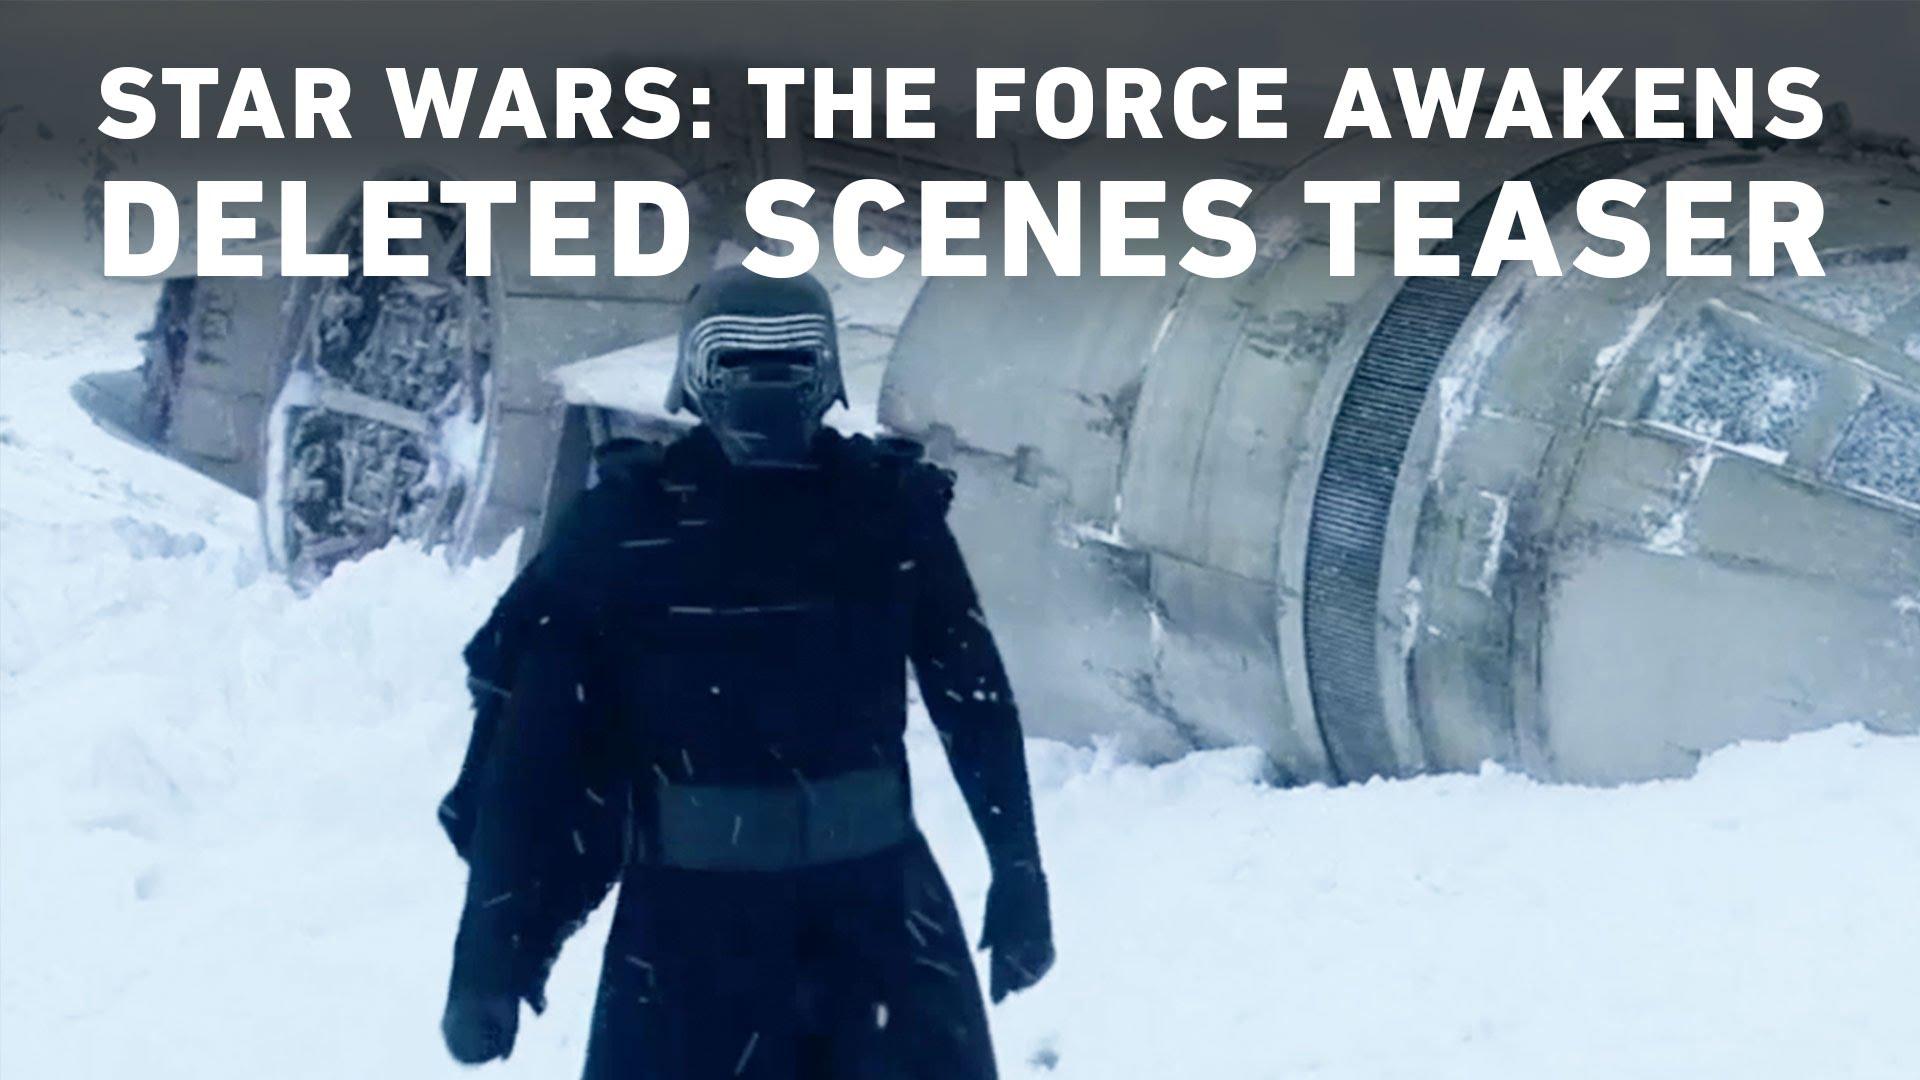 The Force Awakens Deleted Scenes Teaser Released